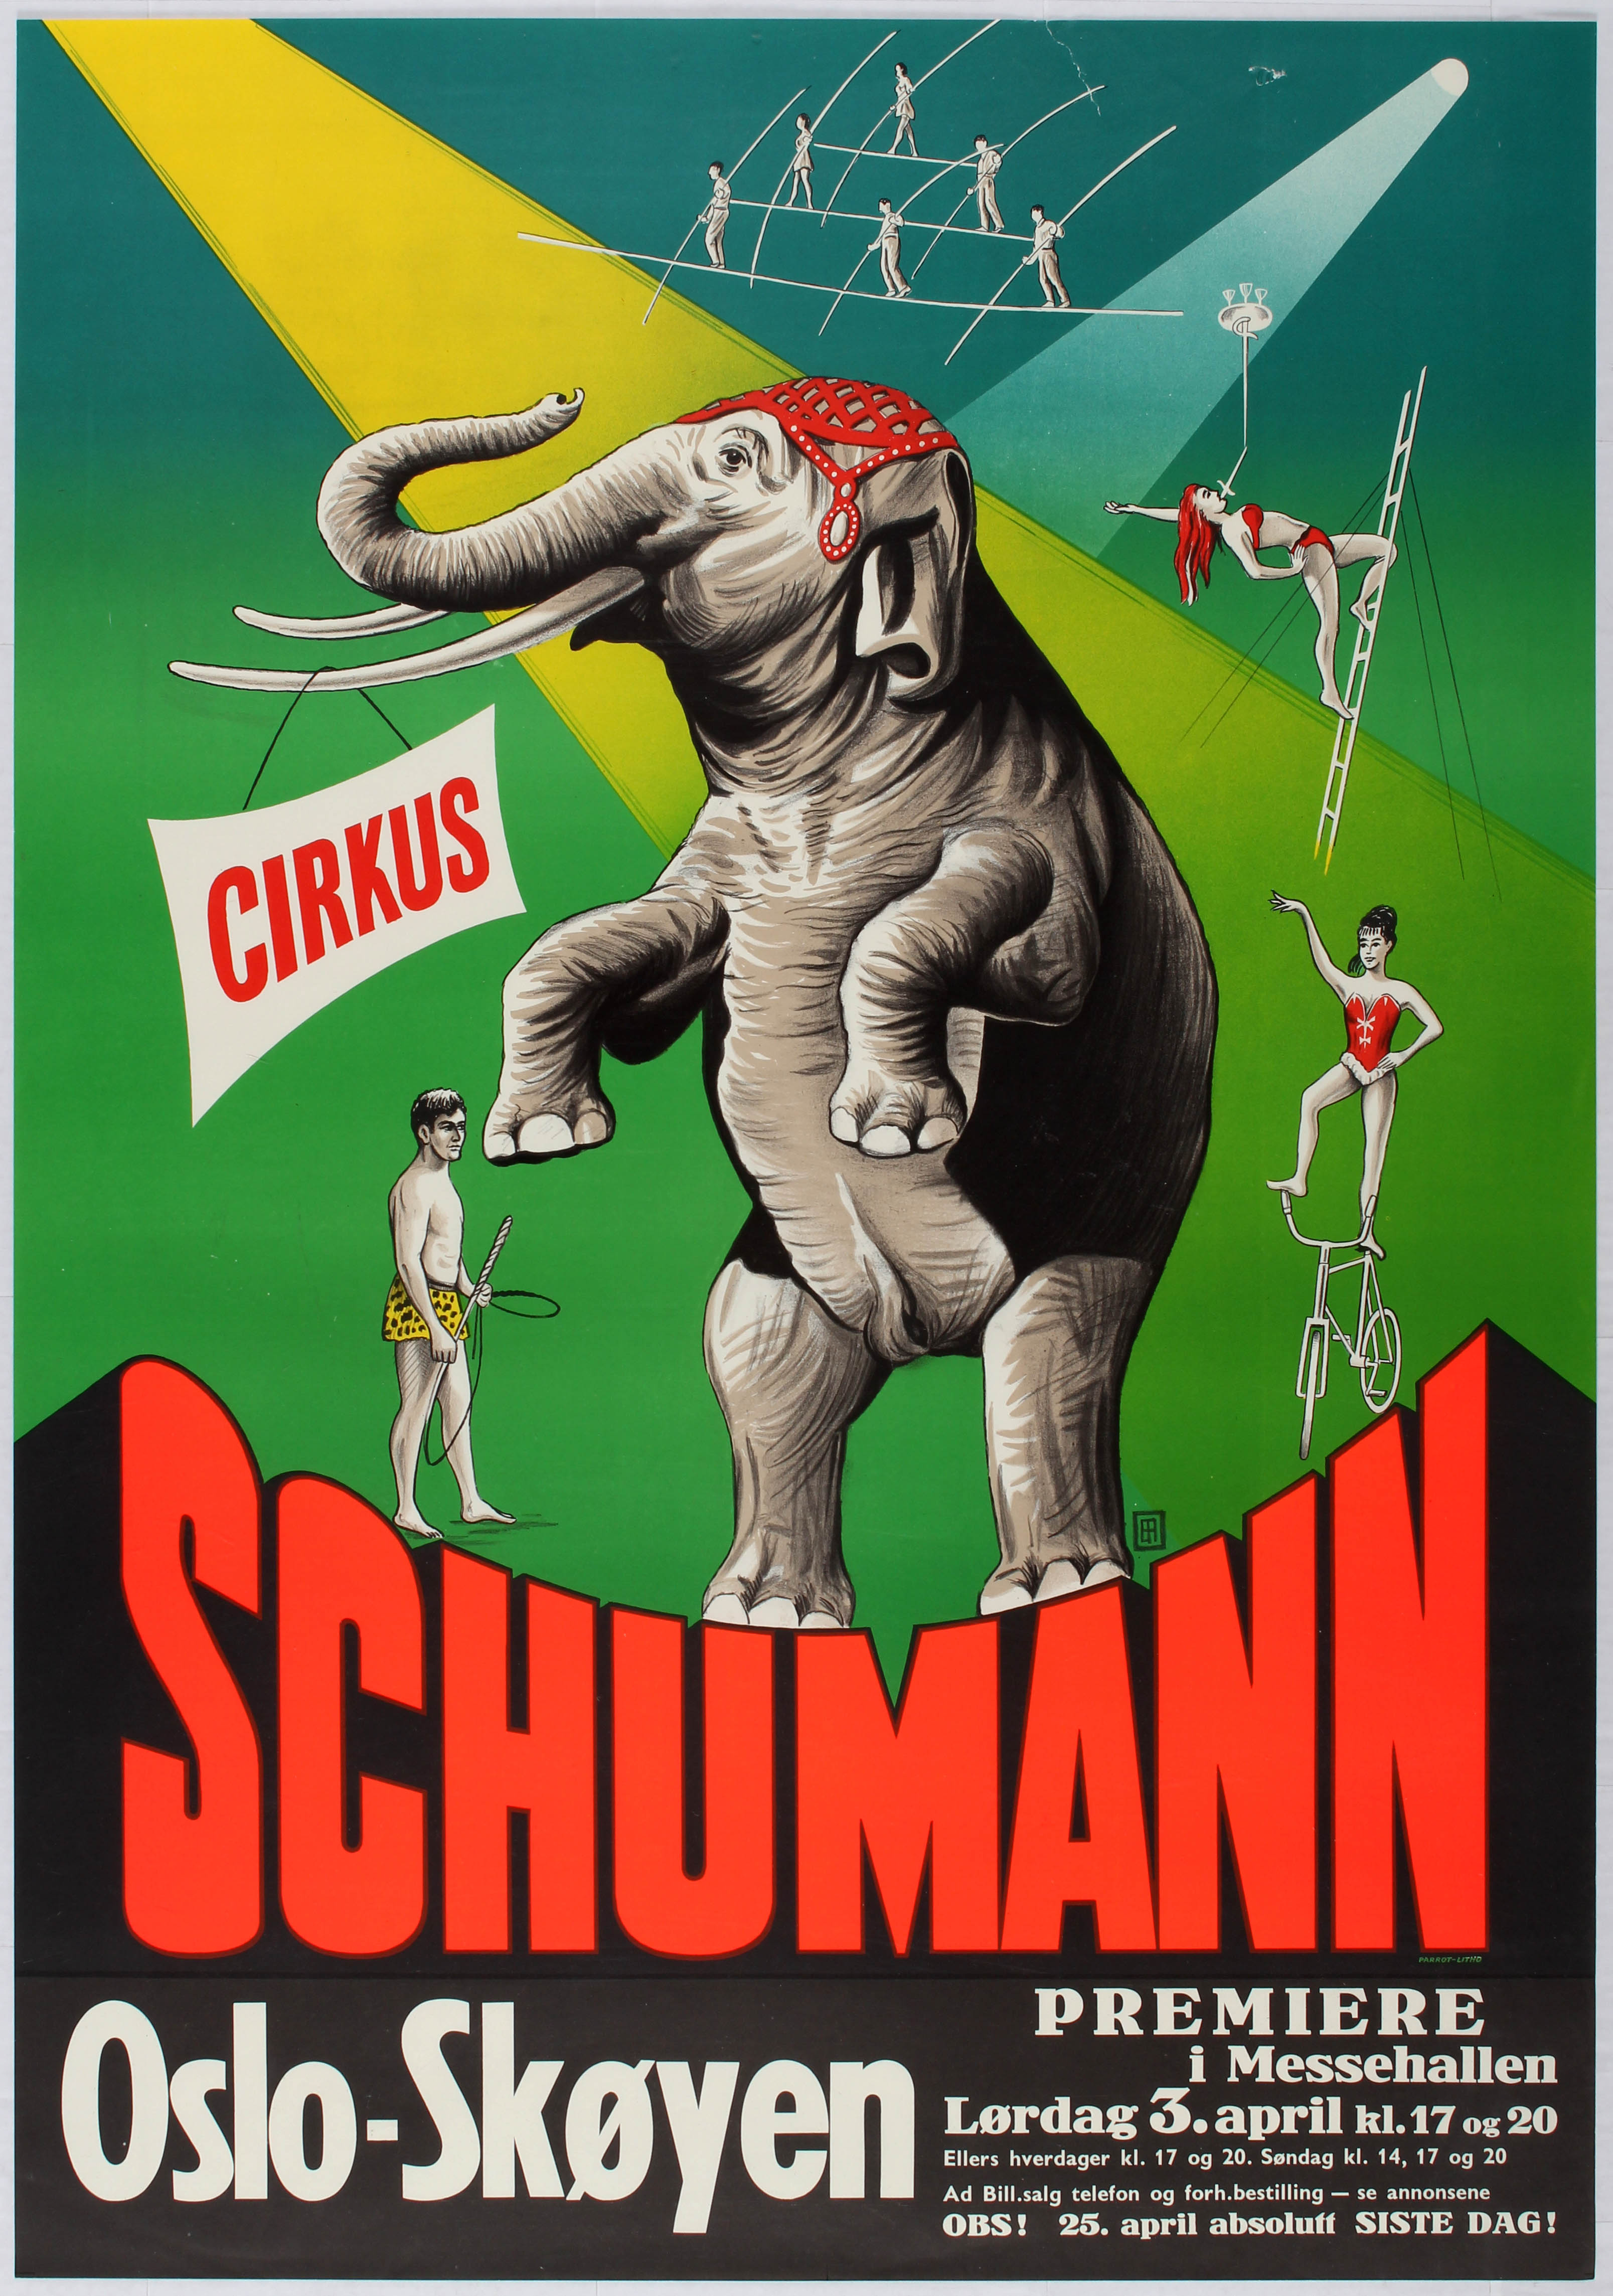 Lot 1701 - Advertising Poster Cirkus Schumann - Oslo